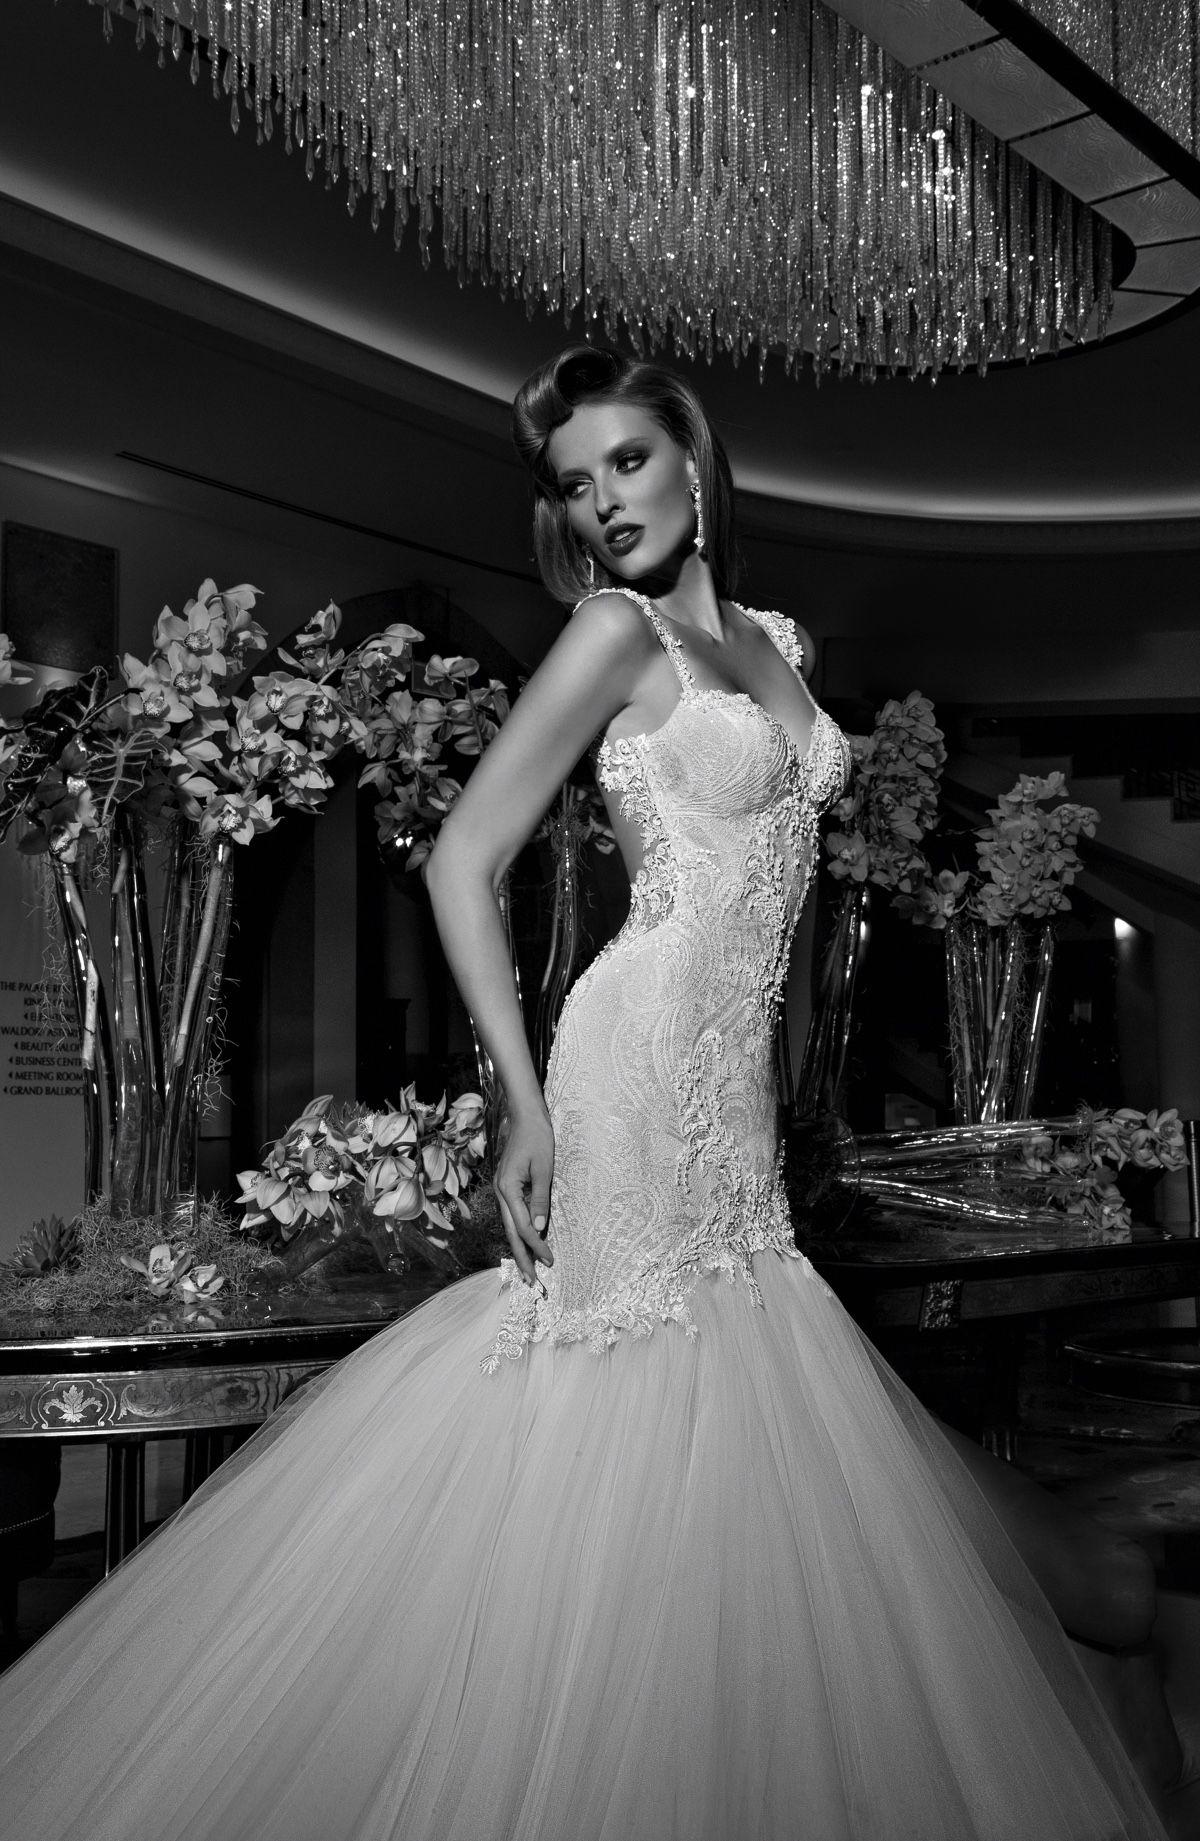 Galia Lahav 2015 Wedding Dresses: Tales of the Jazz Age